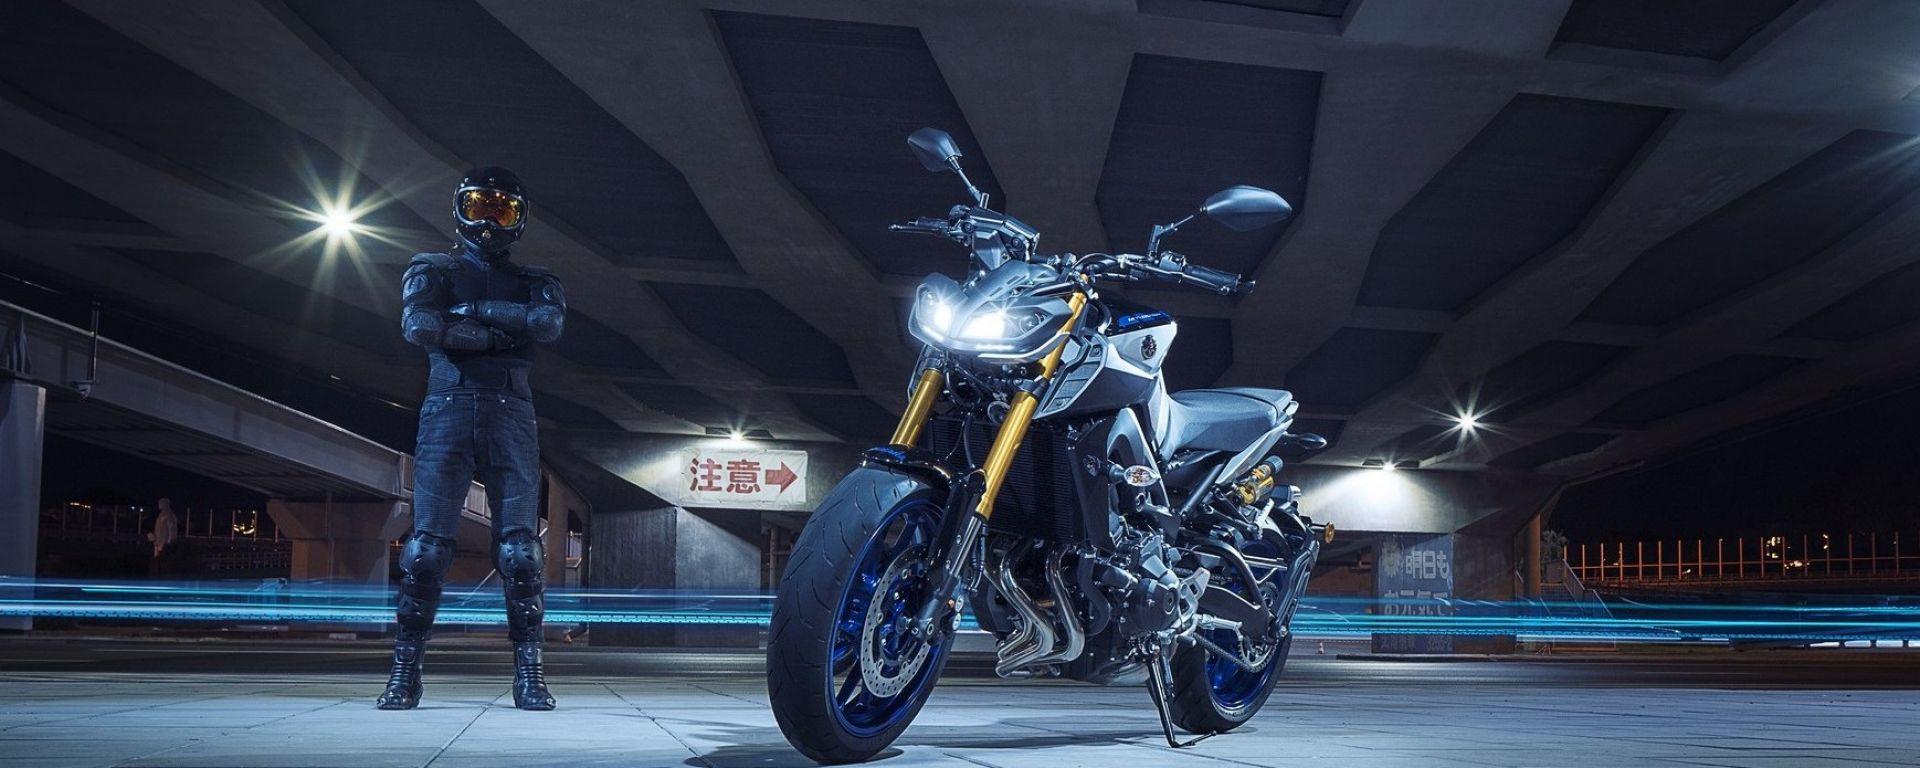 Yamaha MT-09 SP: più sportiva con le sospensioni Ohlins